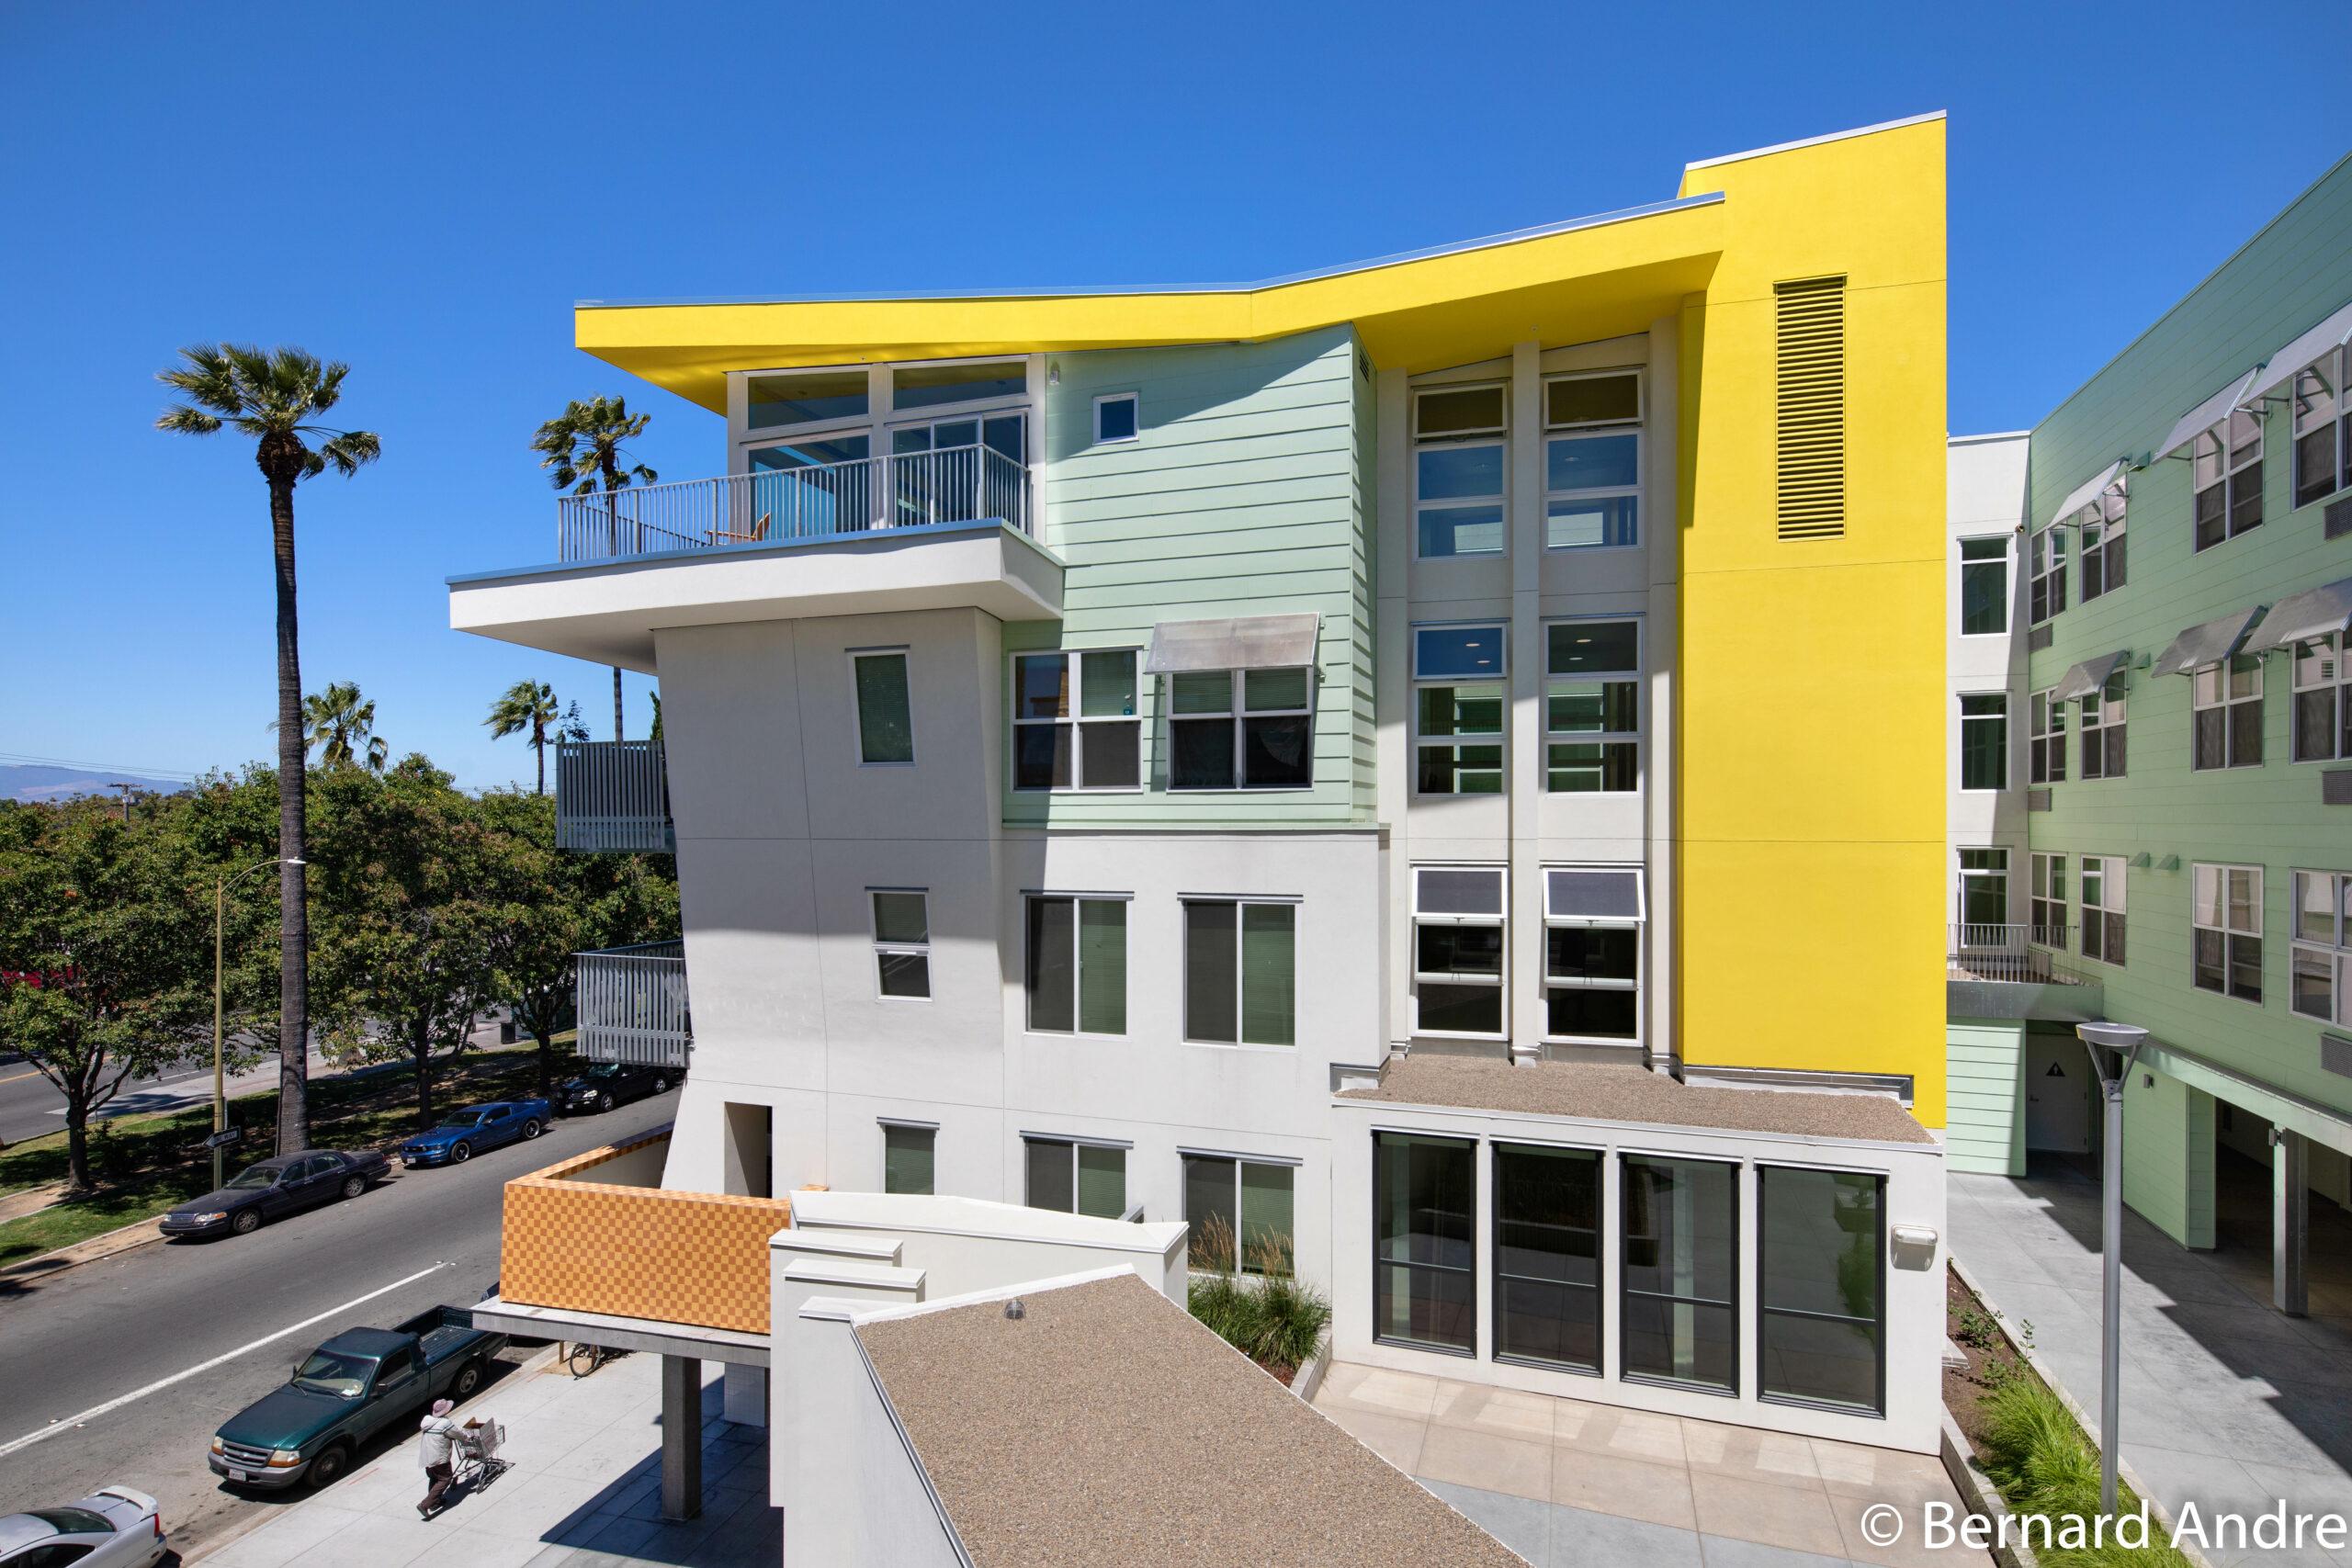 Second Street Studios - First Community Housing